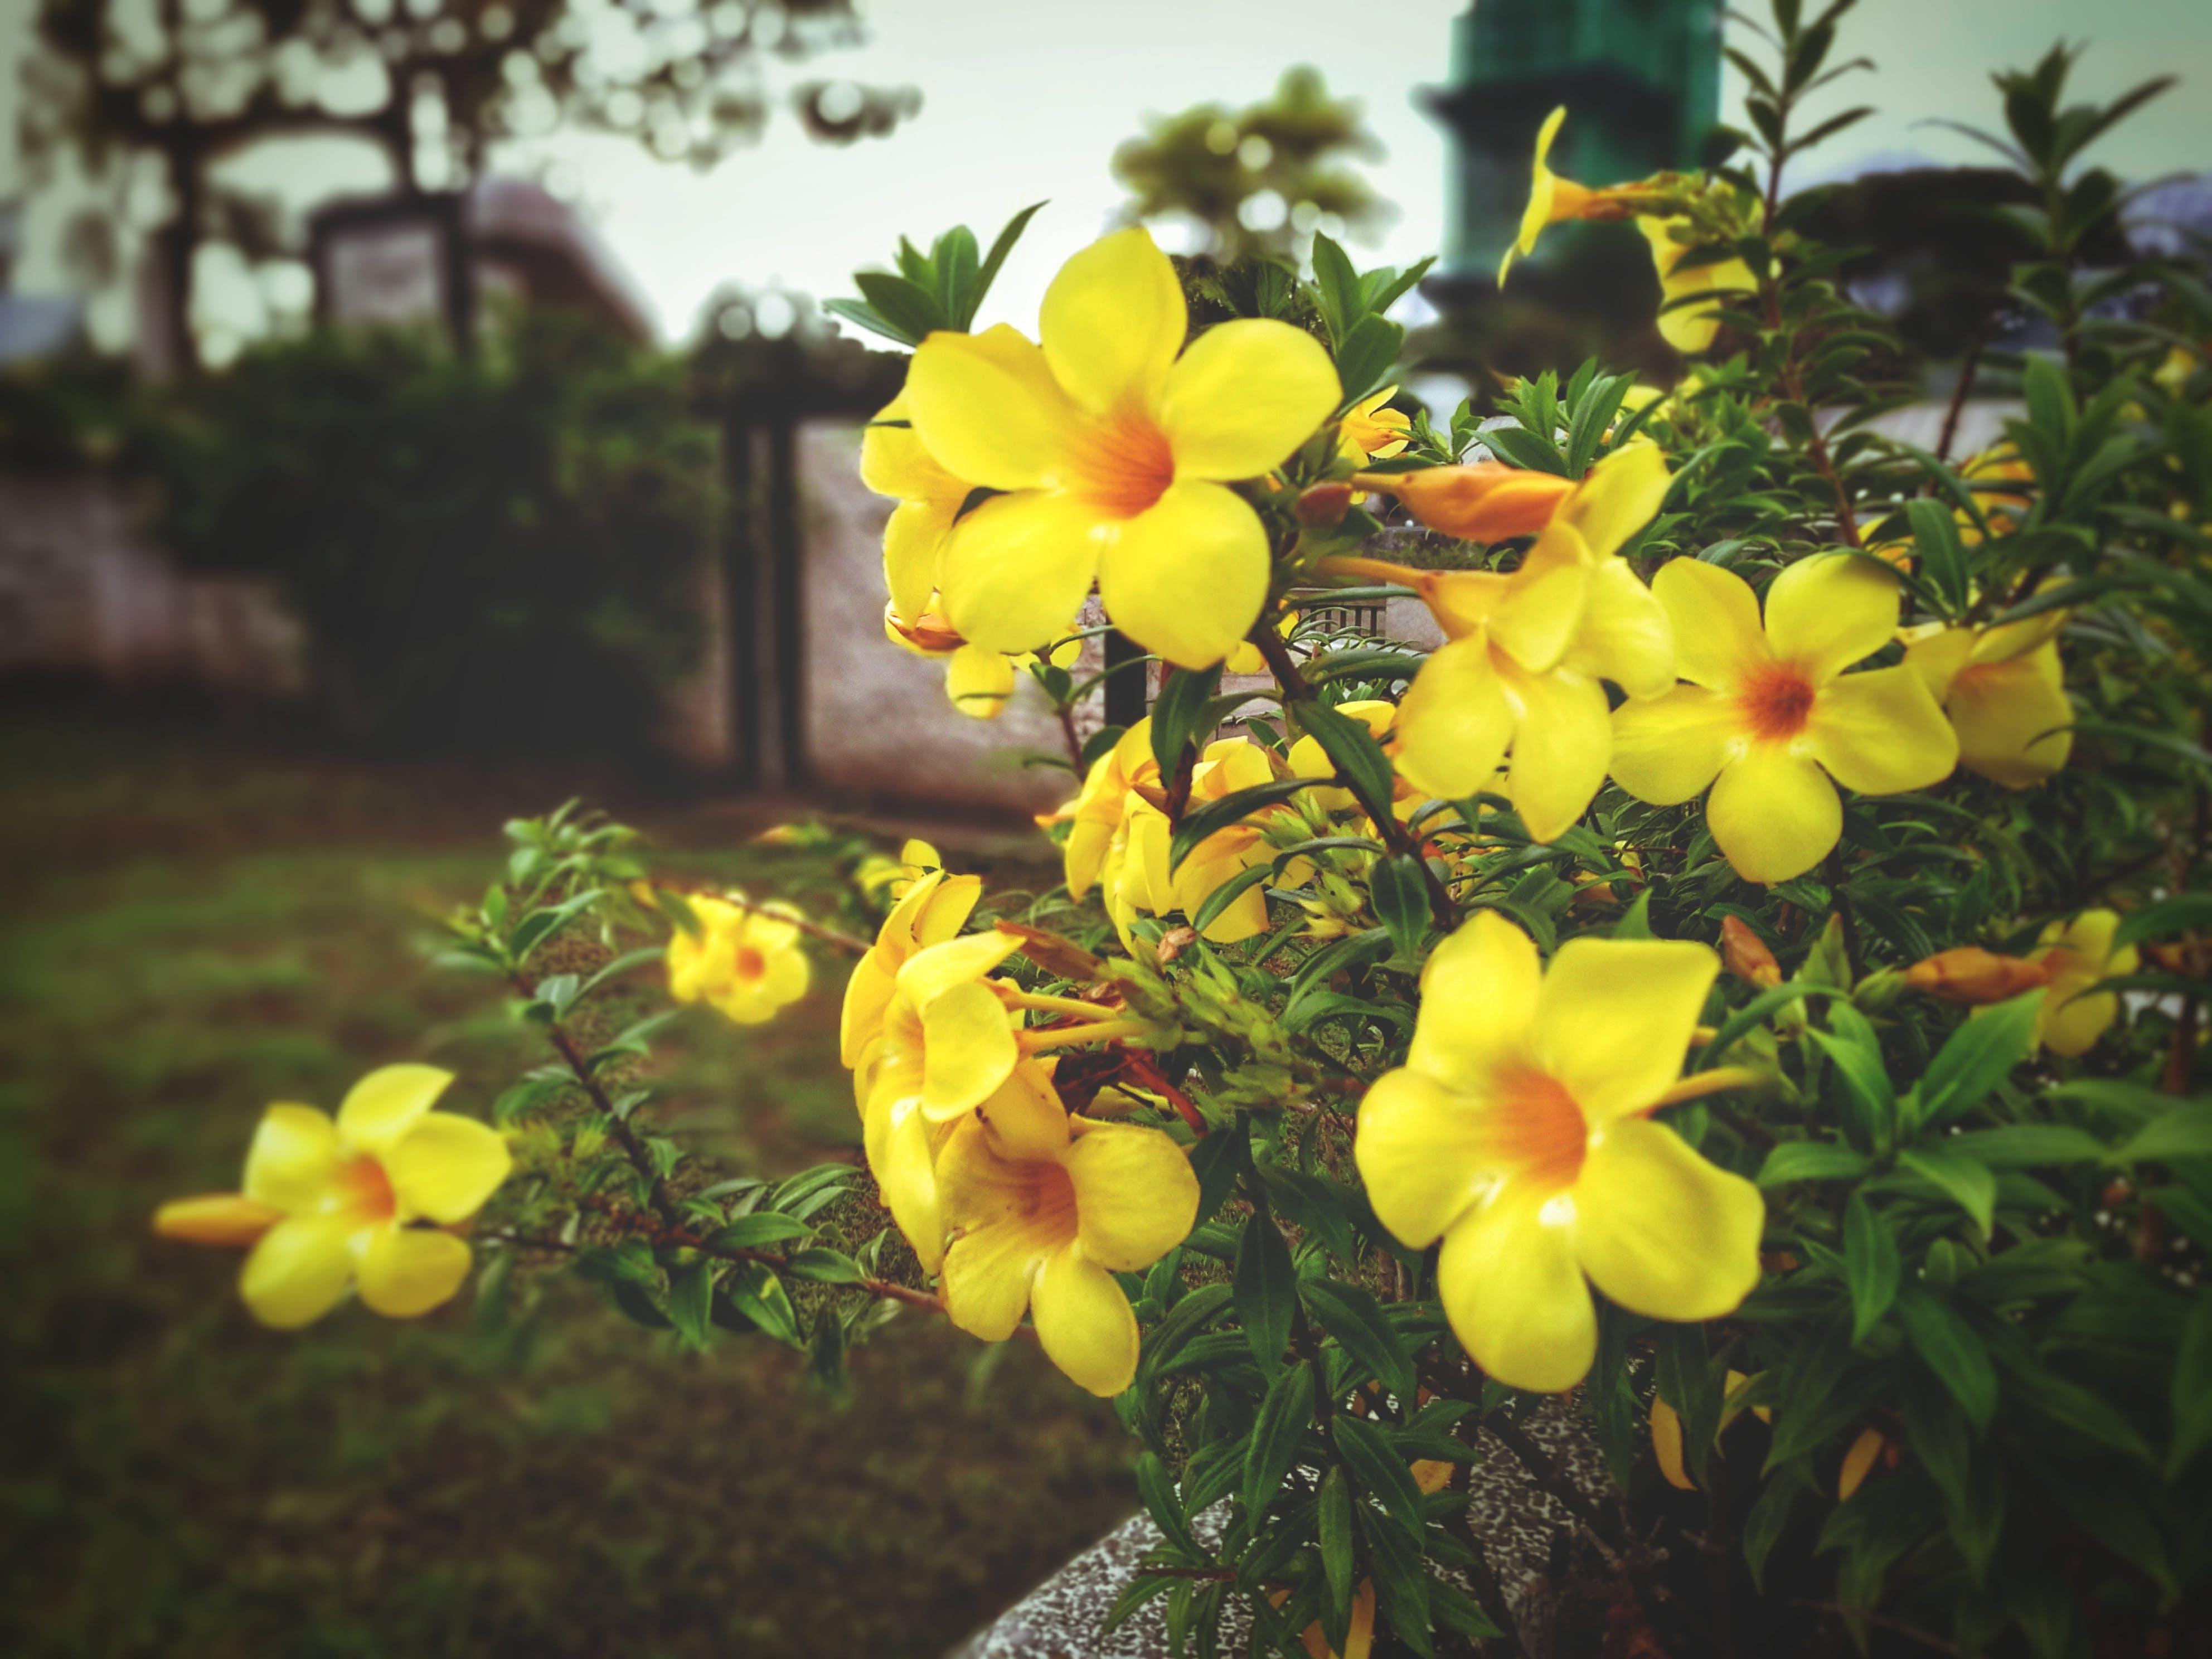 Free stock photo of garden, yellow, yellow flowers, flower garden